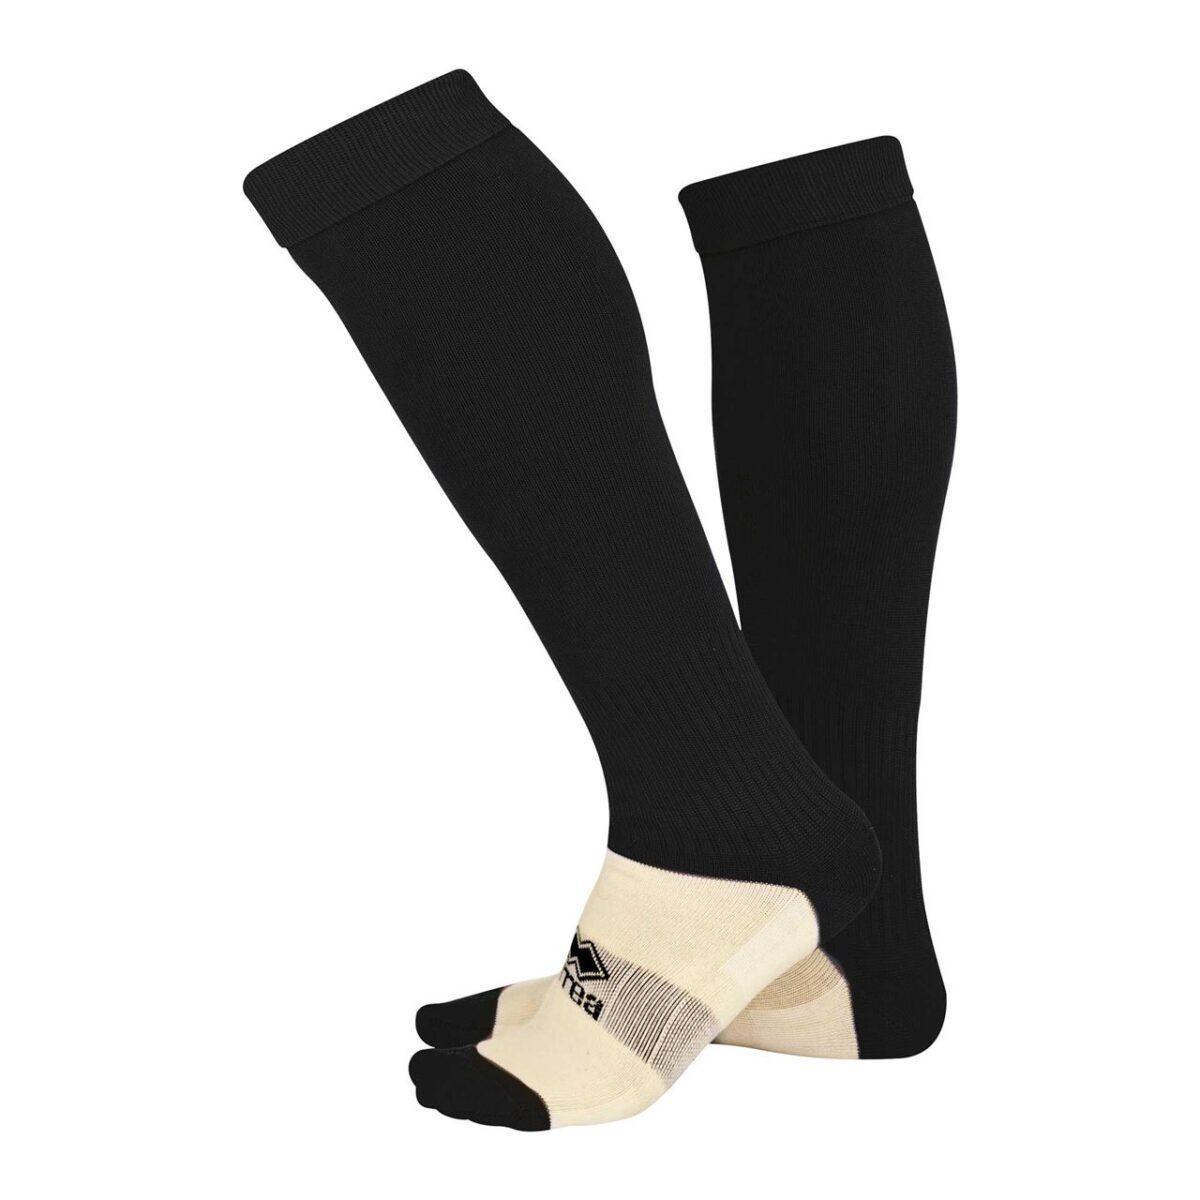 Newtown AFC Errea Polyestere Socks - Adult